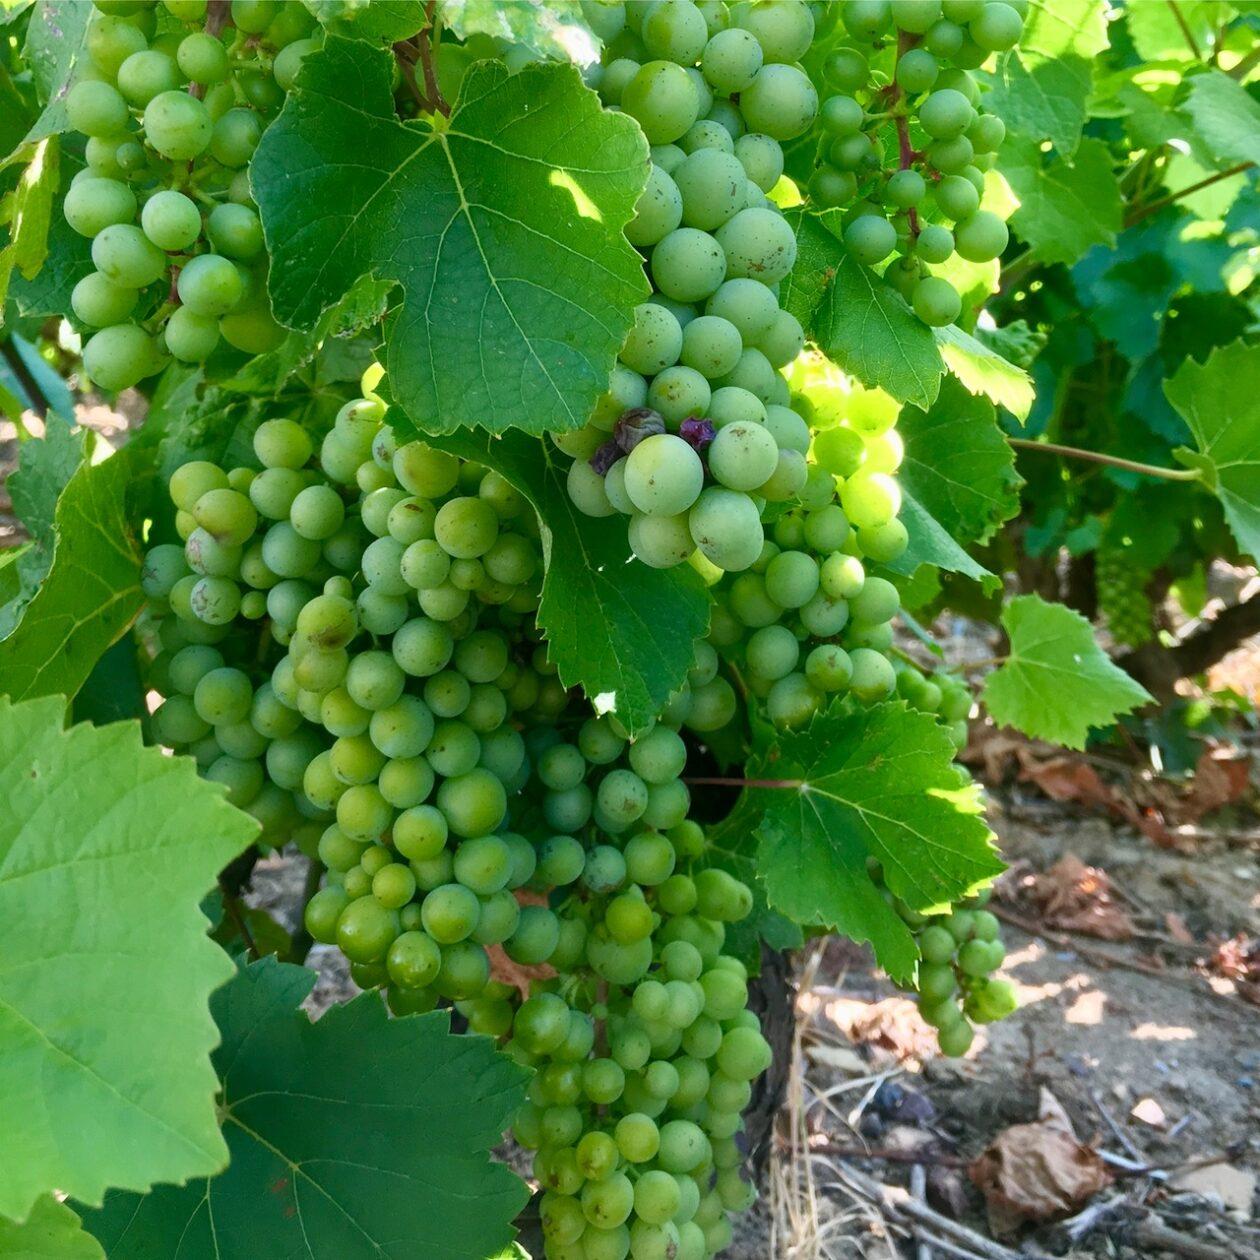 Gamay grapes in a Juliénas vineyard